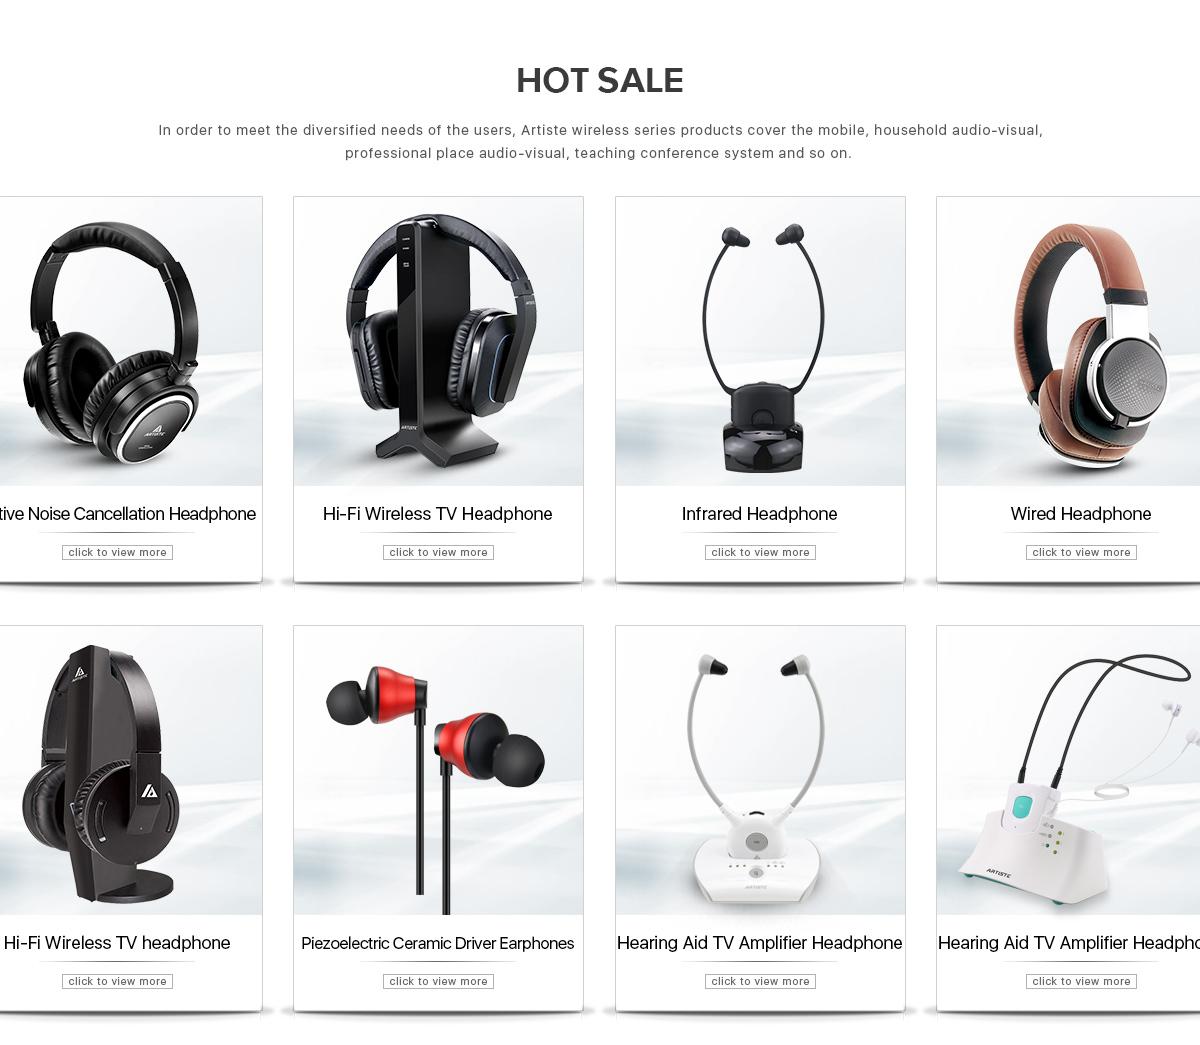 Guangzhou Artiste Technology Co., Ltd. - Wireless Headset, Wired Headset